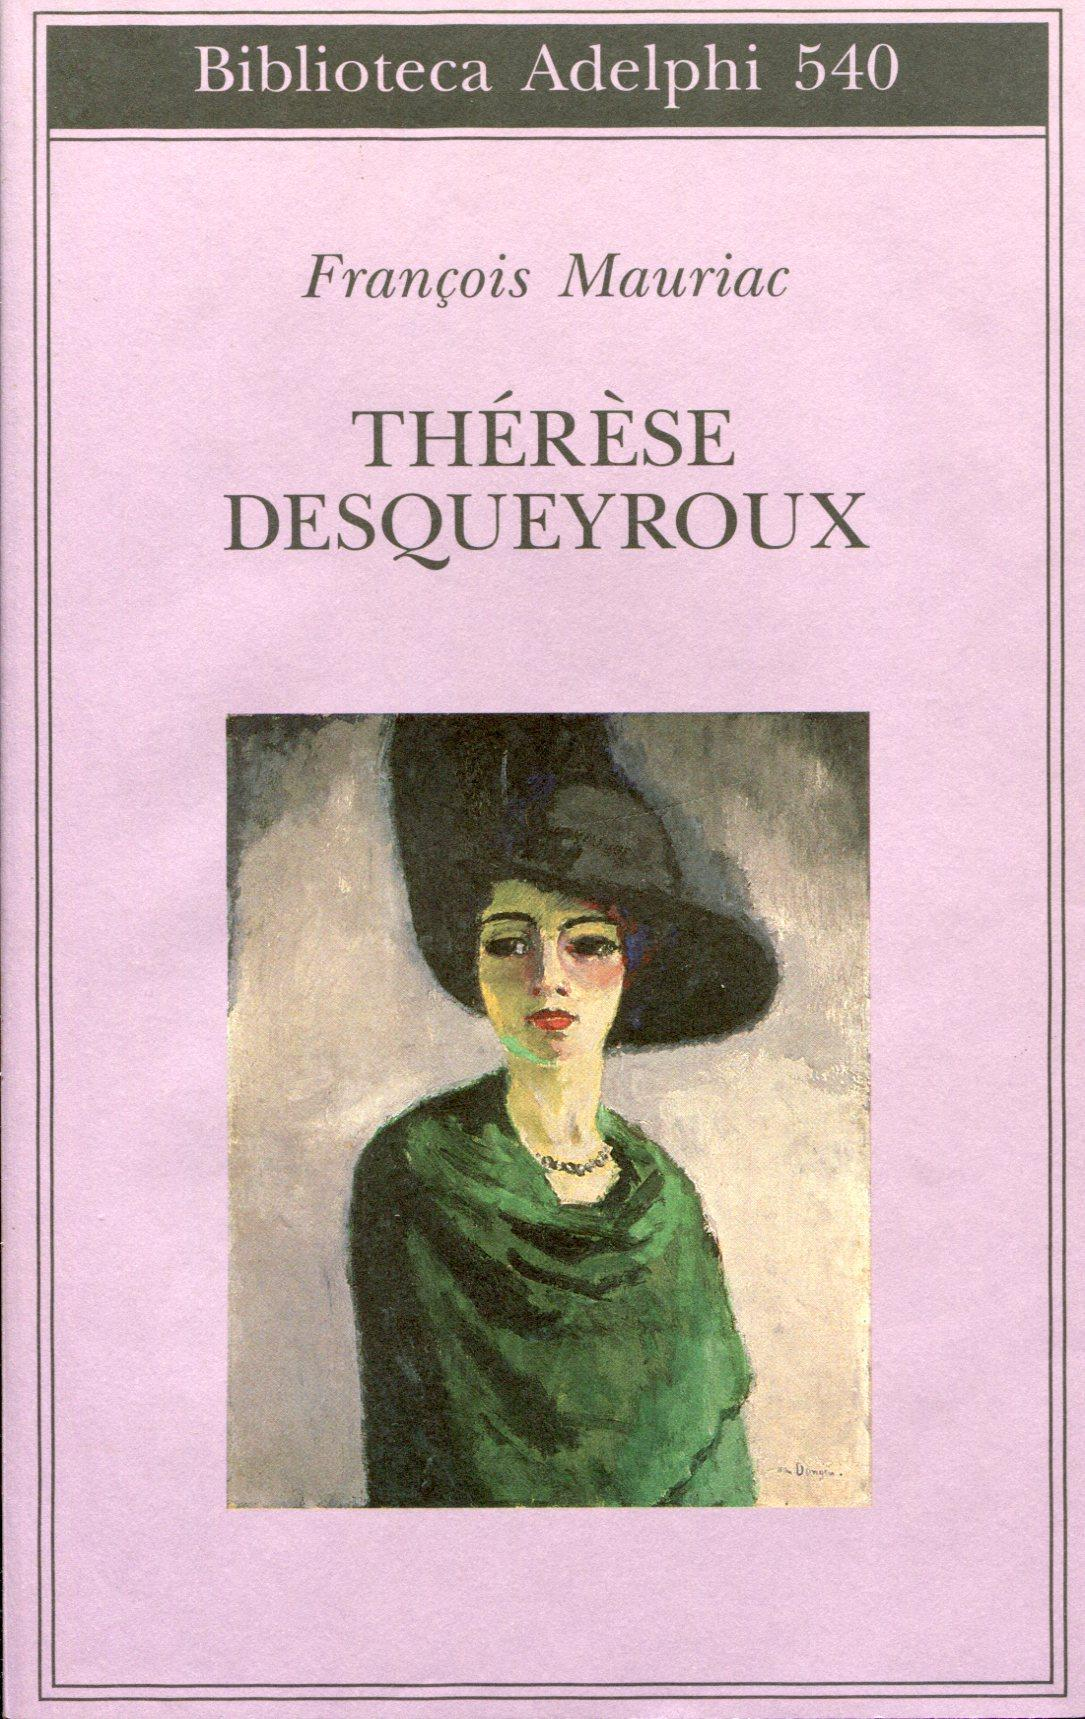 Therese Desqueyroux - MAURIAC, Francois (Bordeaux, 1885 - Parigi, 1970)